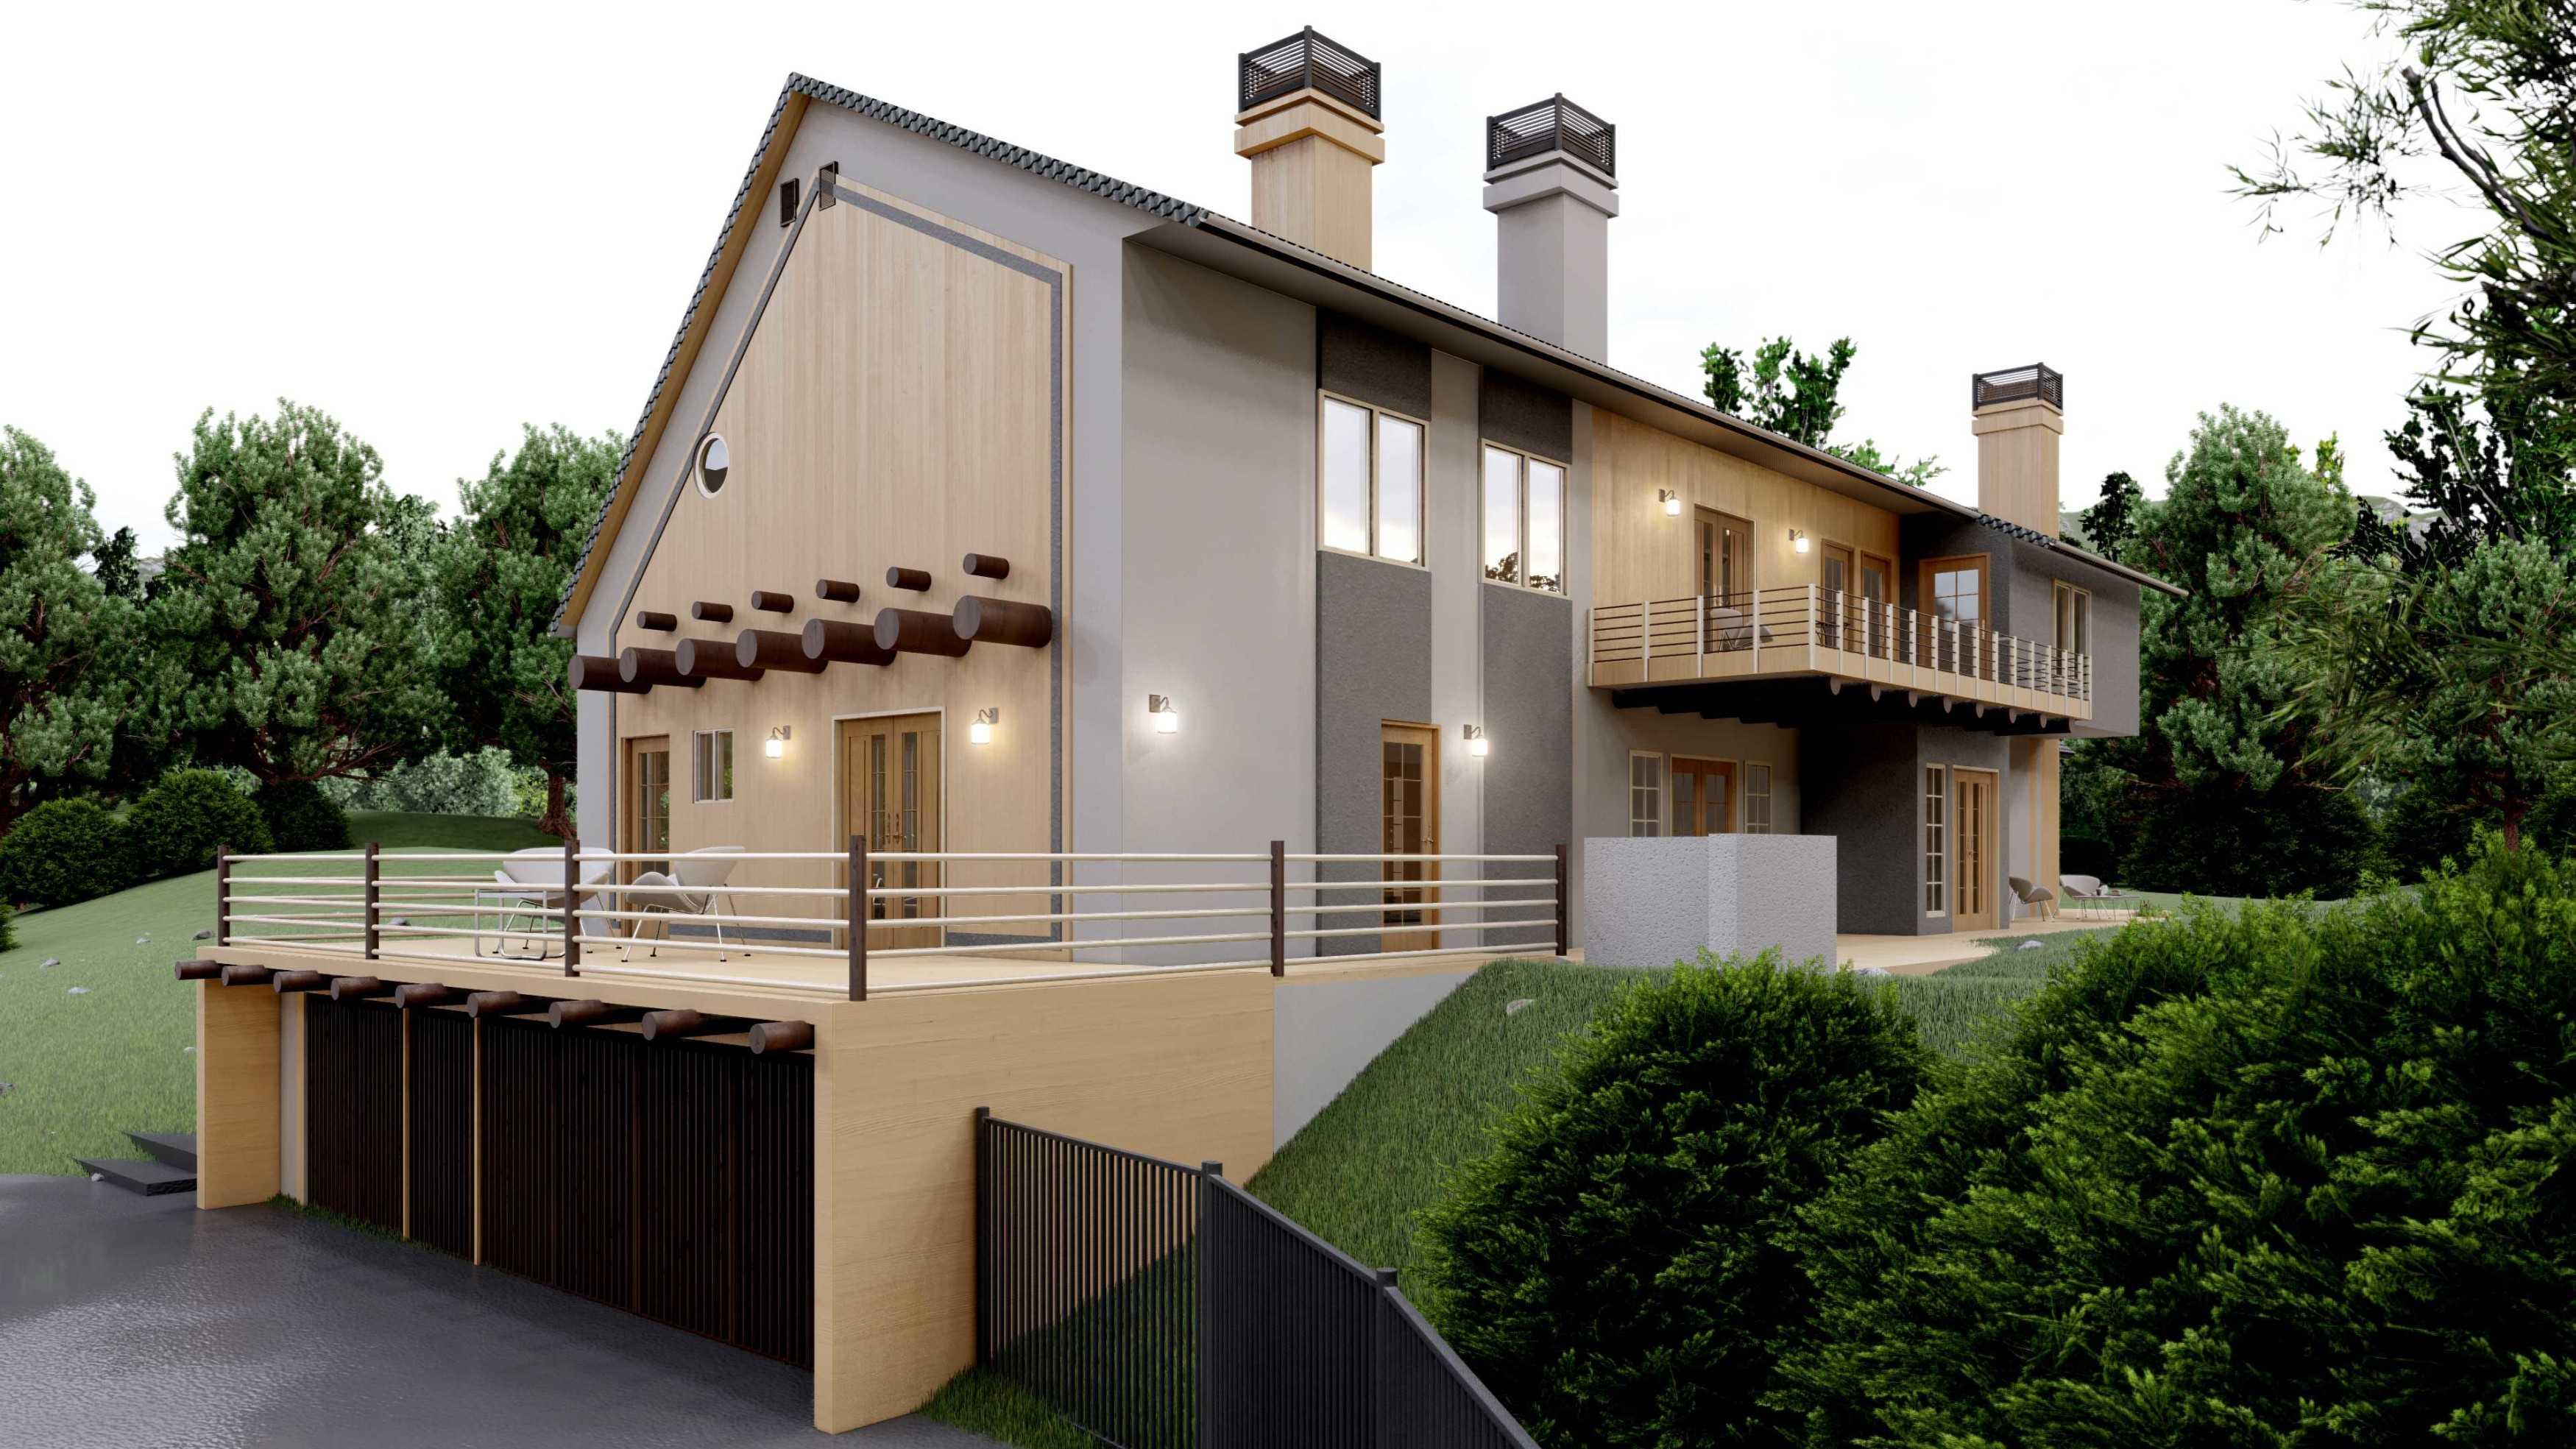 Whn Studio Exterior Update For Santa Fe Style Home In Southern California California, Amerika Serikat California, Amerika Serikat Achmad-Wahana-Karimullah-Exterior-Update-For-Santa-Fe-Style-Home-In-Southern-California Classic  87214